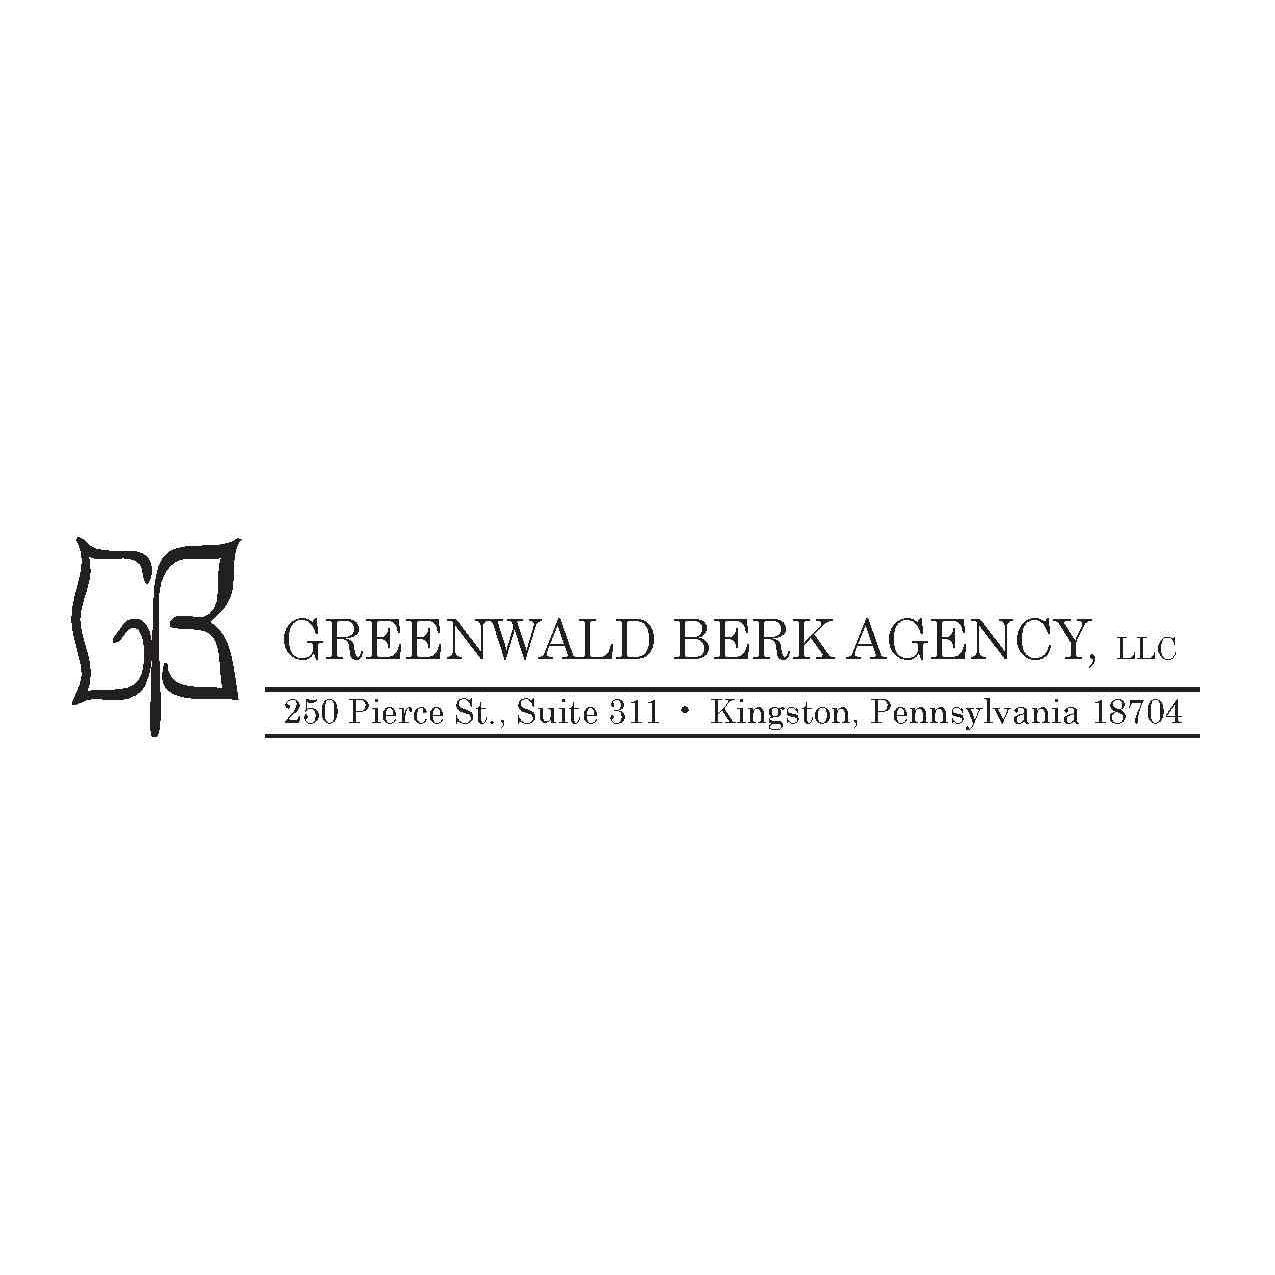 Greenwald Berk Agency, LLC